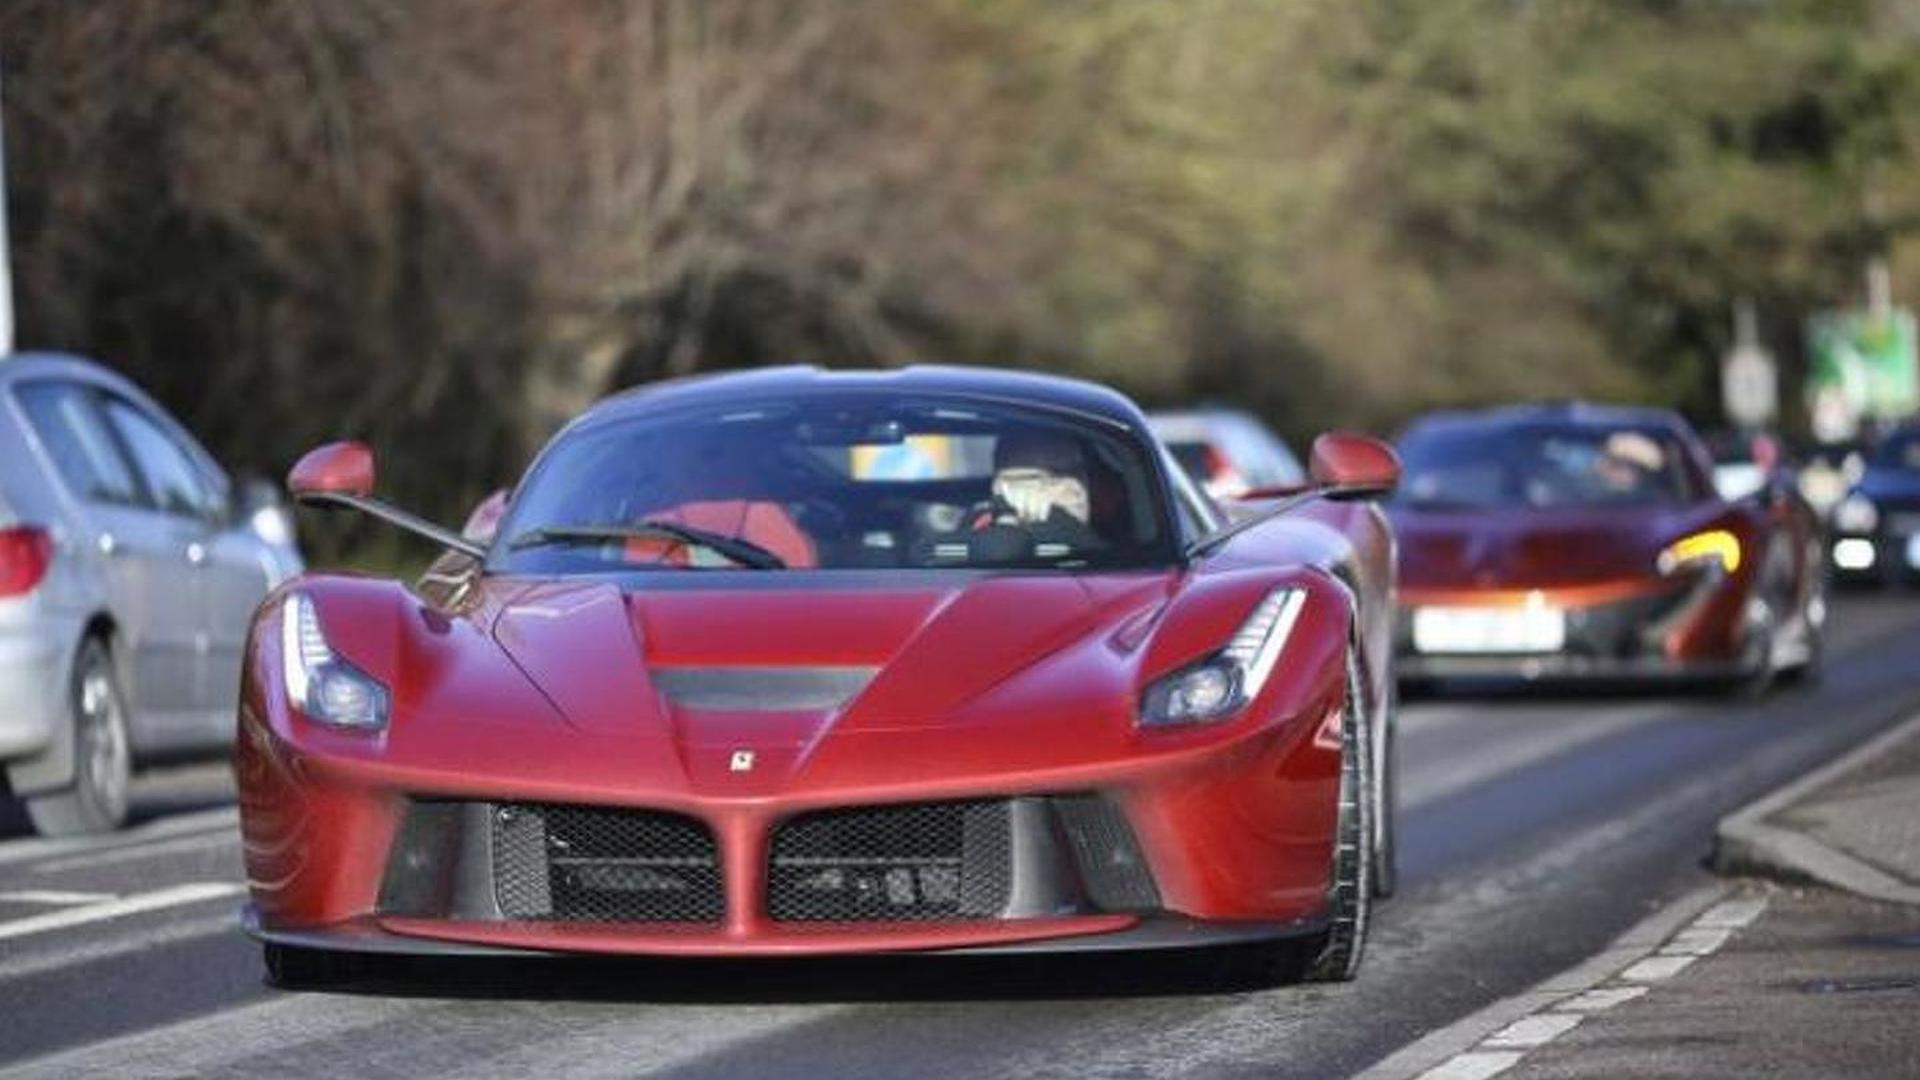 meet the man who owns the hottest supercar trio laferrari, mclaren